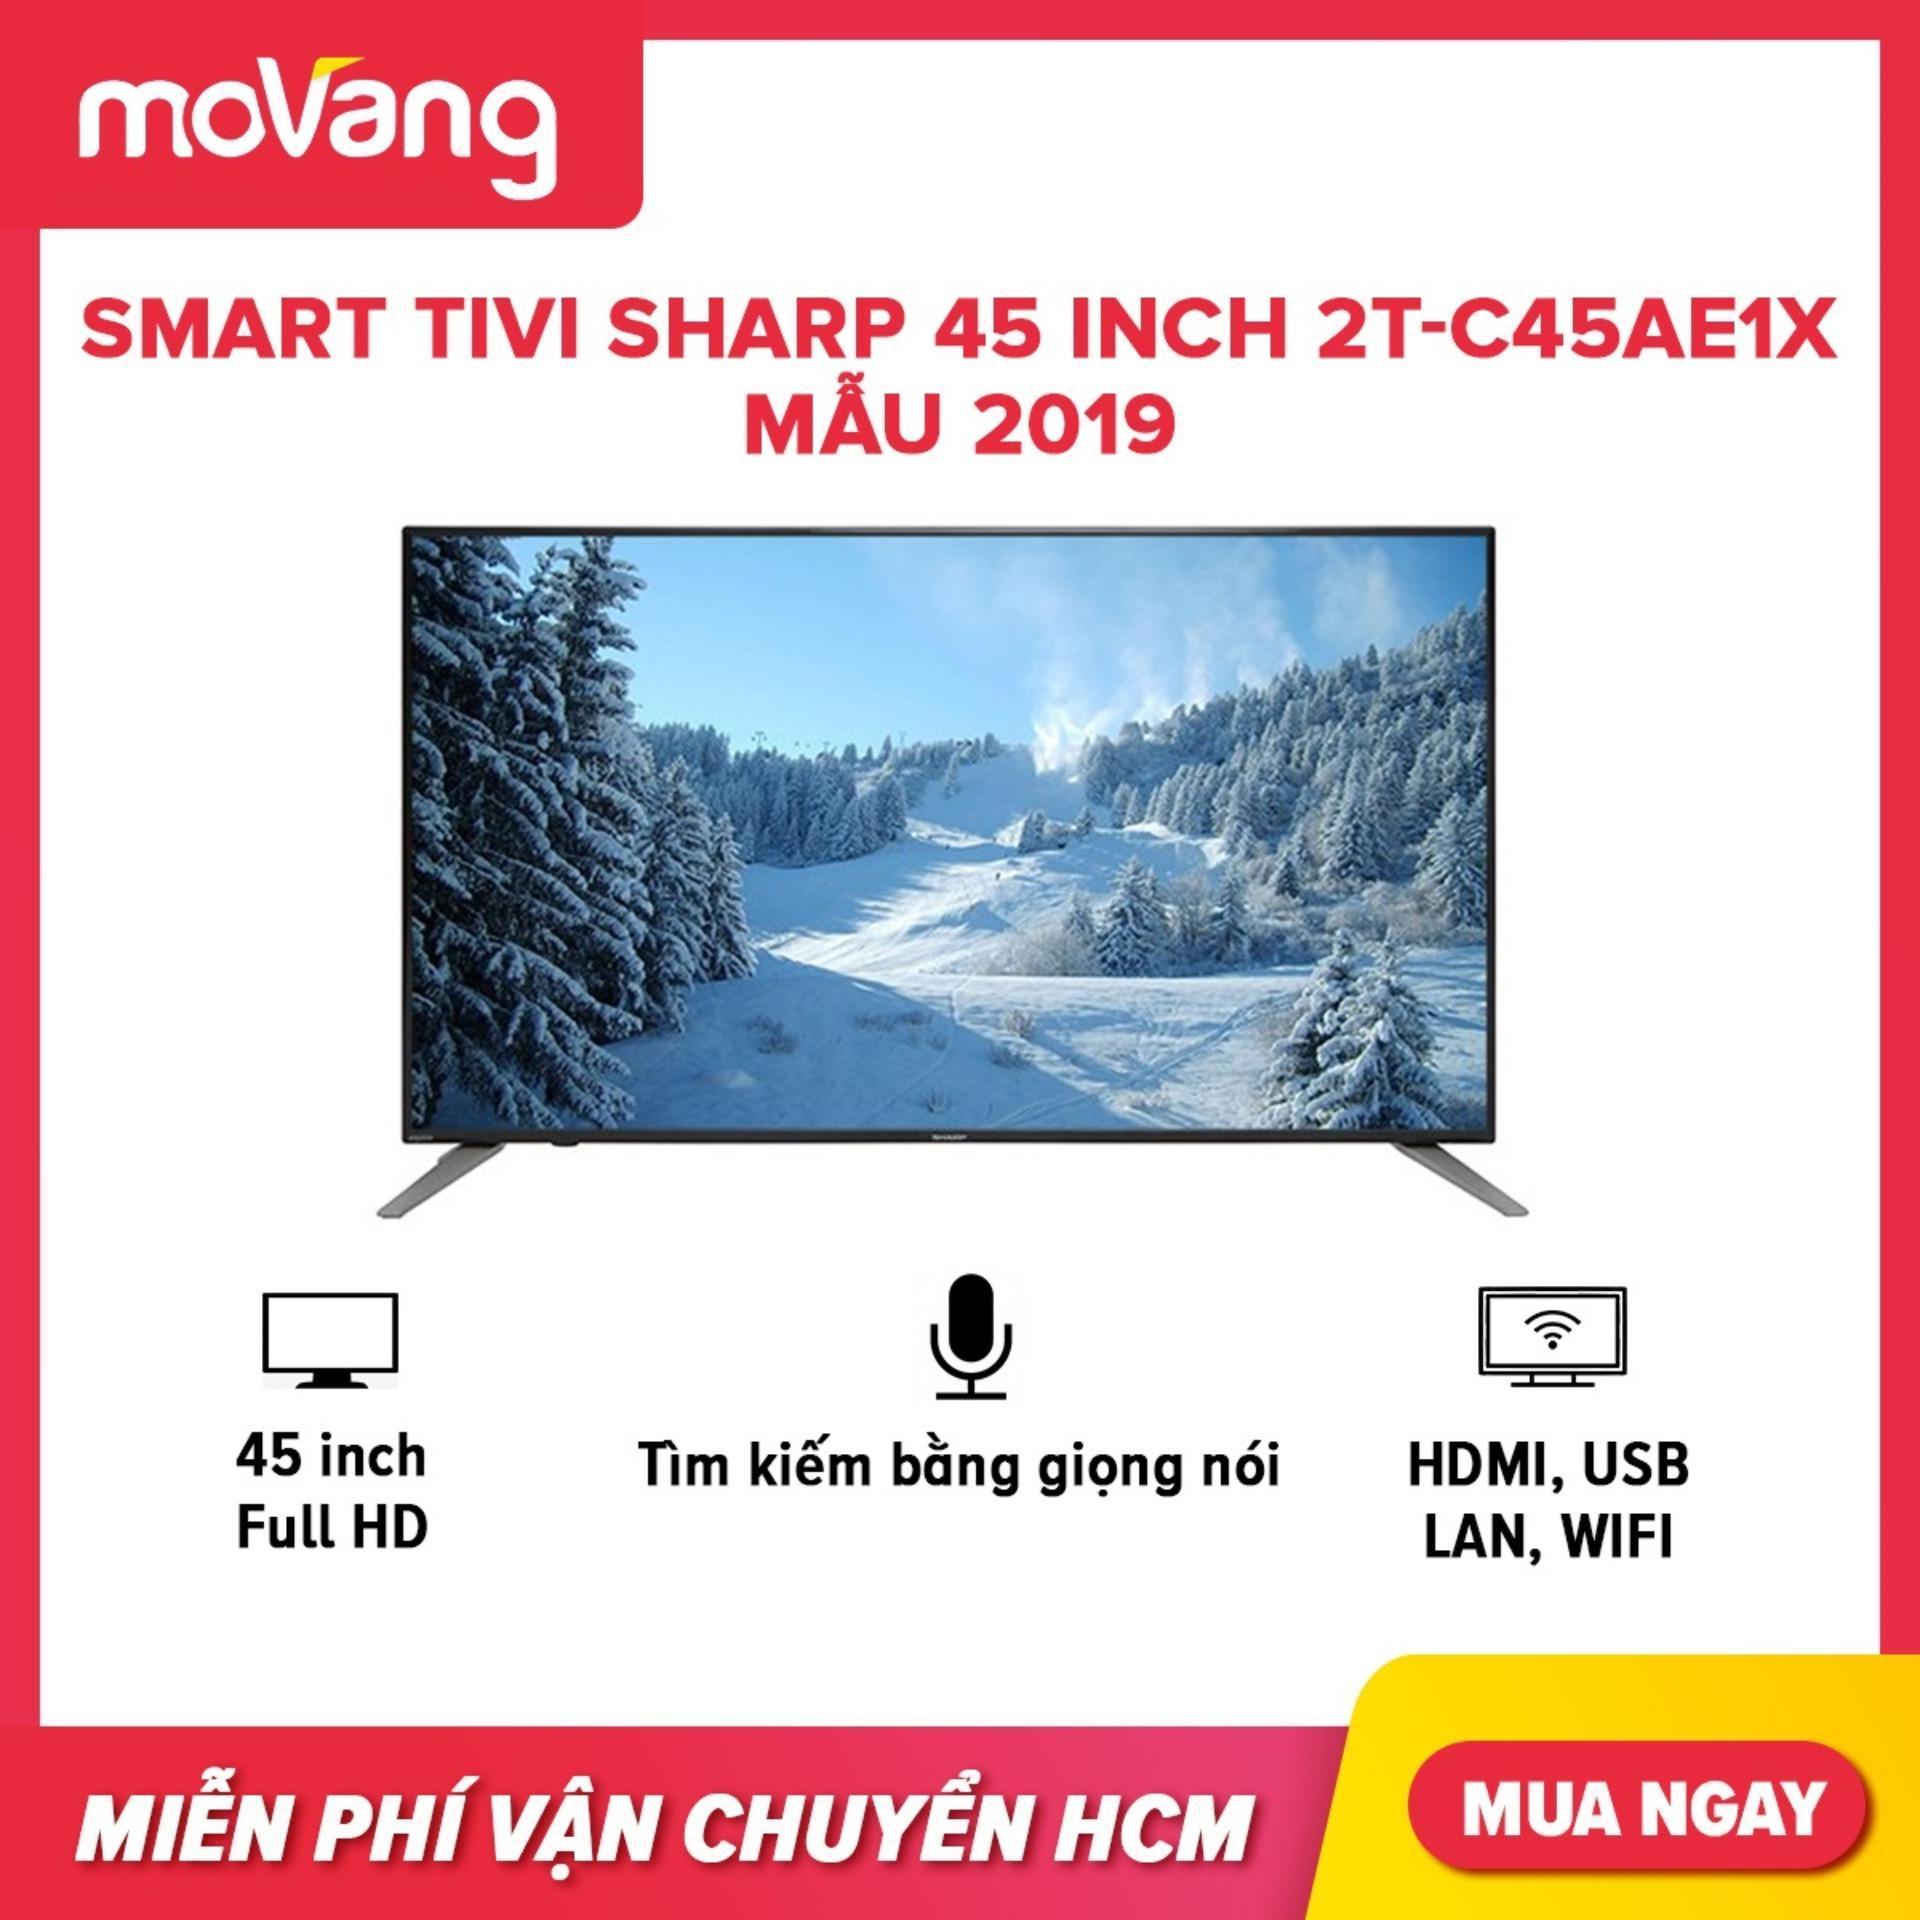 Smart Tivi Sharp 45 inch 2T-C45AE1X Mẫu 2019